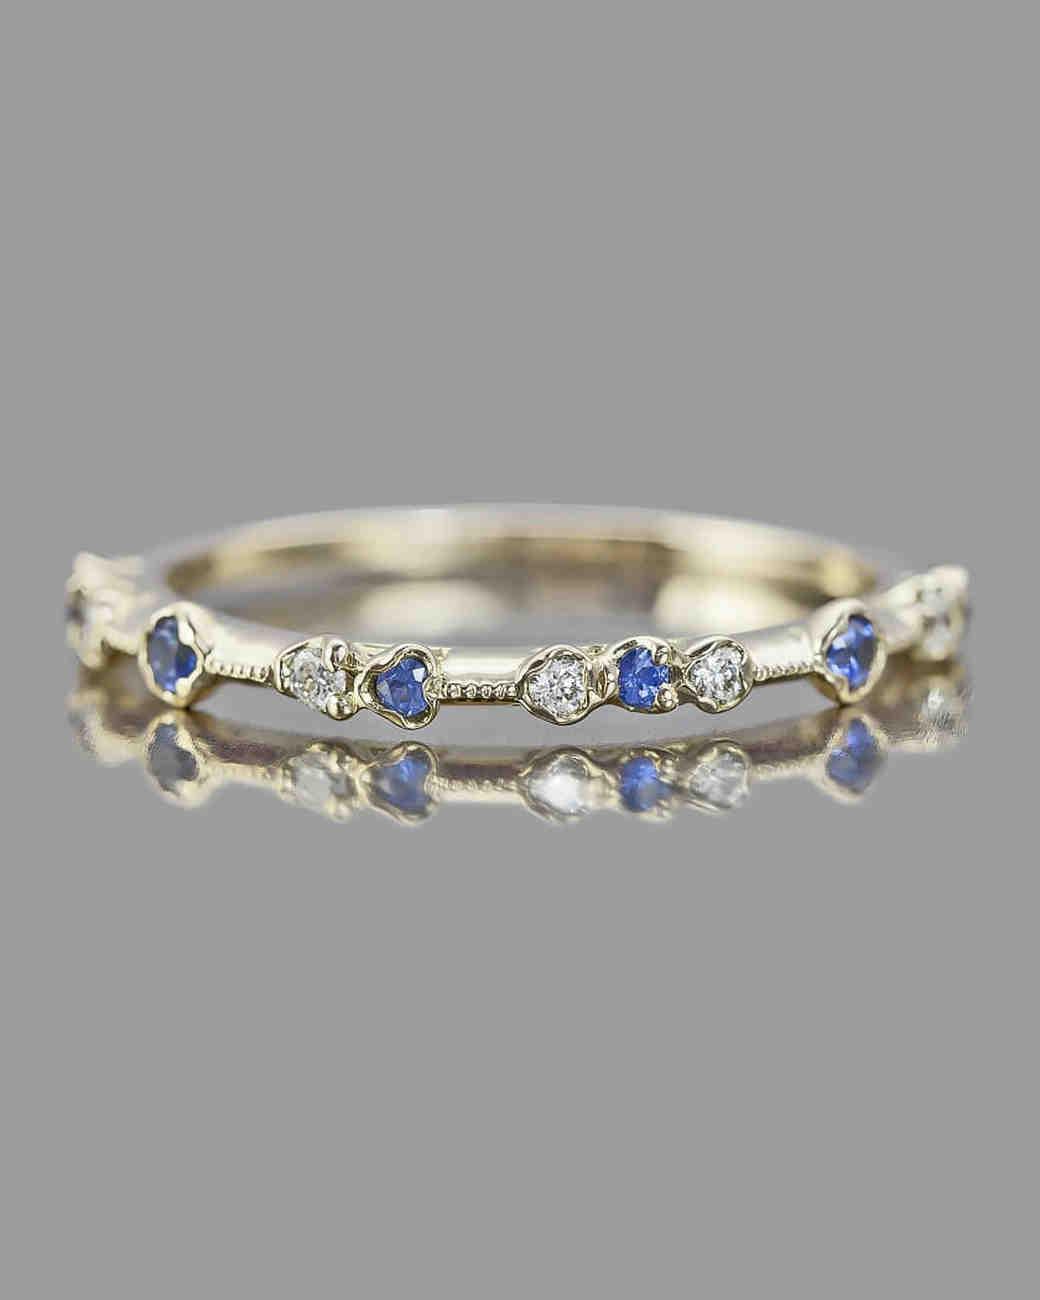 bfde24f58240ff The Prettiest Delicate Wedding Bands for Modern Brides | Martha Stewart  Weddings